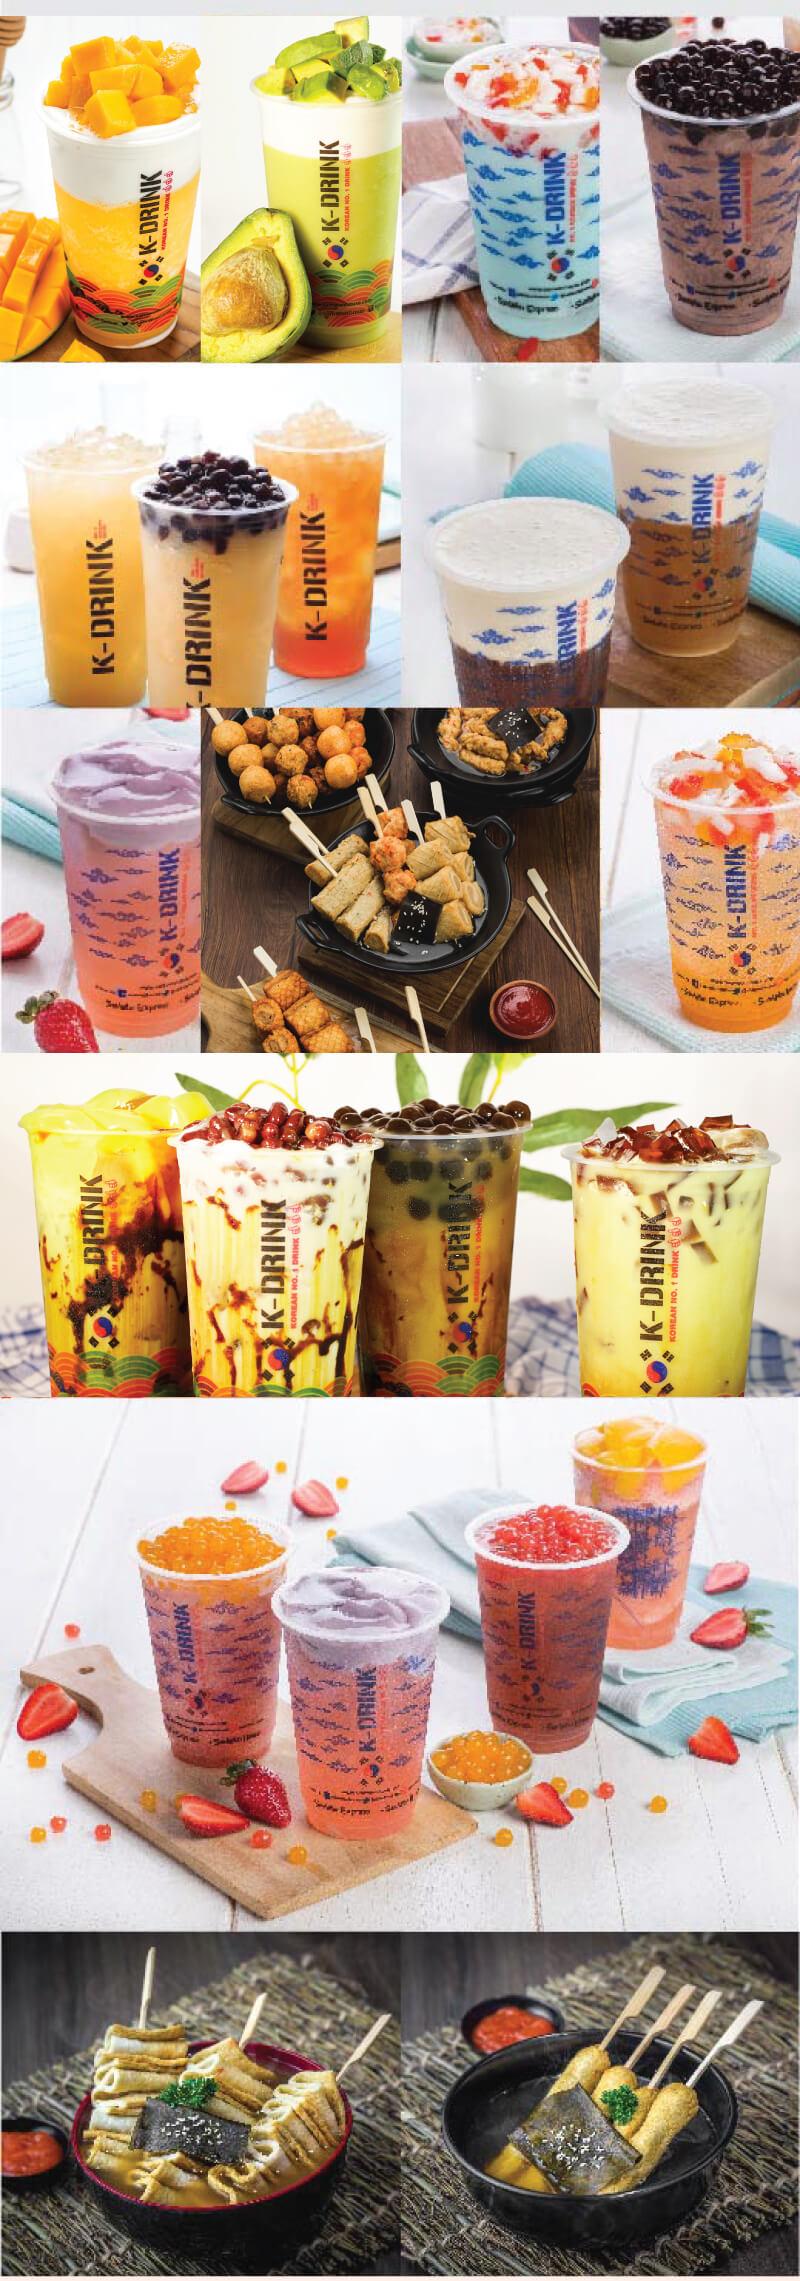 brosur menu minuman menyegarkan samwon